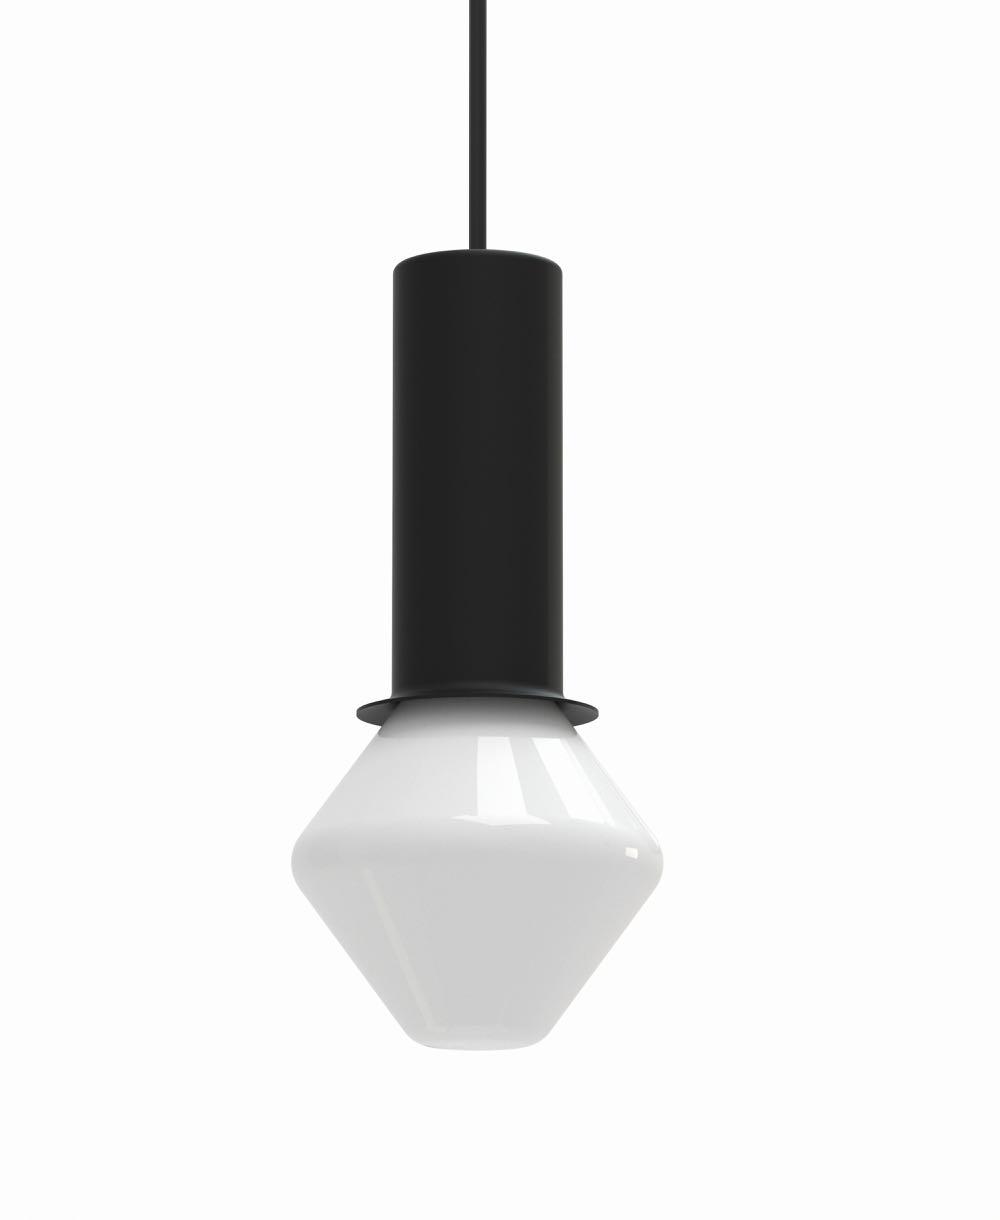 Wirkkala's TW003 pendant lamp from1960 has recently been reissued by Artek. Photo courtesy of Artek.